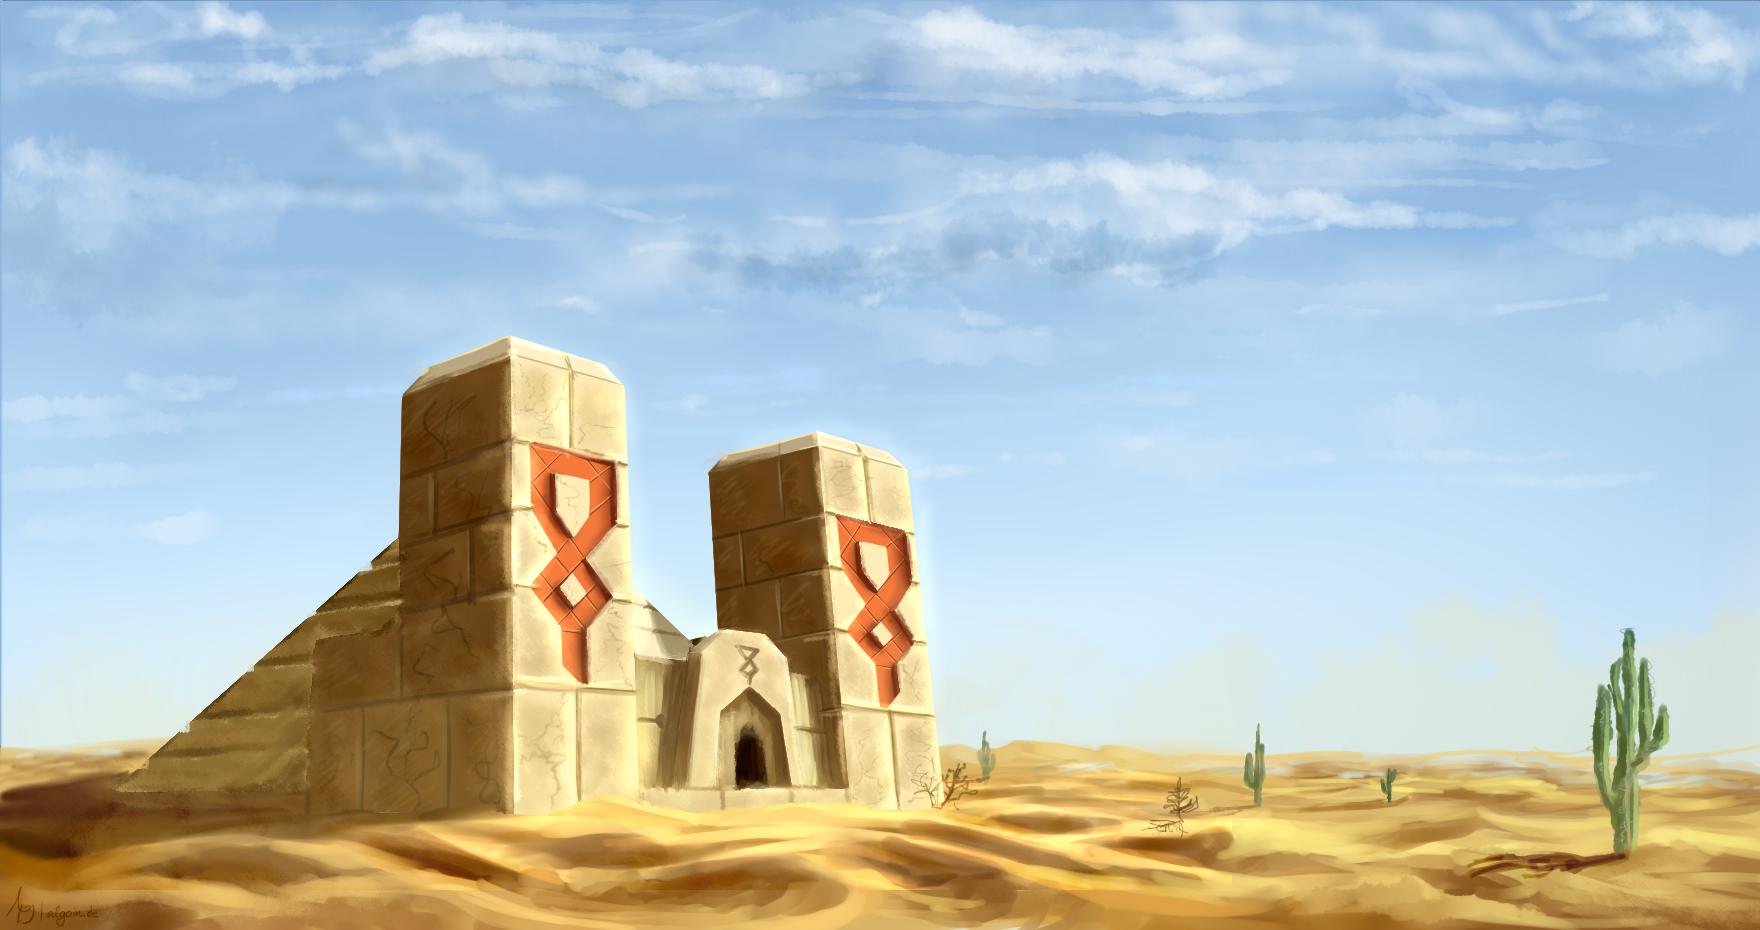 Minecraft Desert Temple  Minecraft drawings, Minecraft, Desert temple